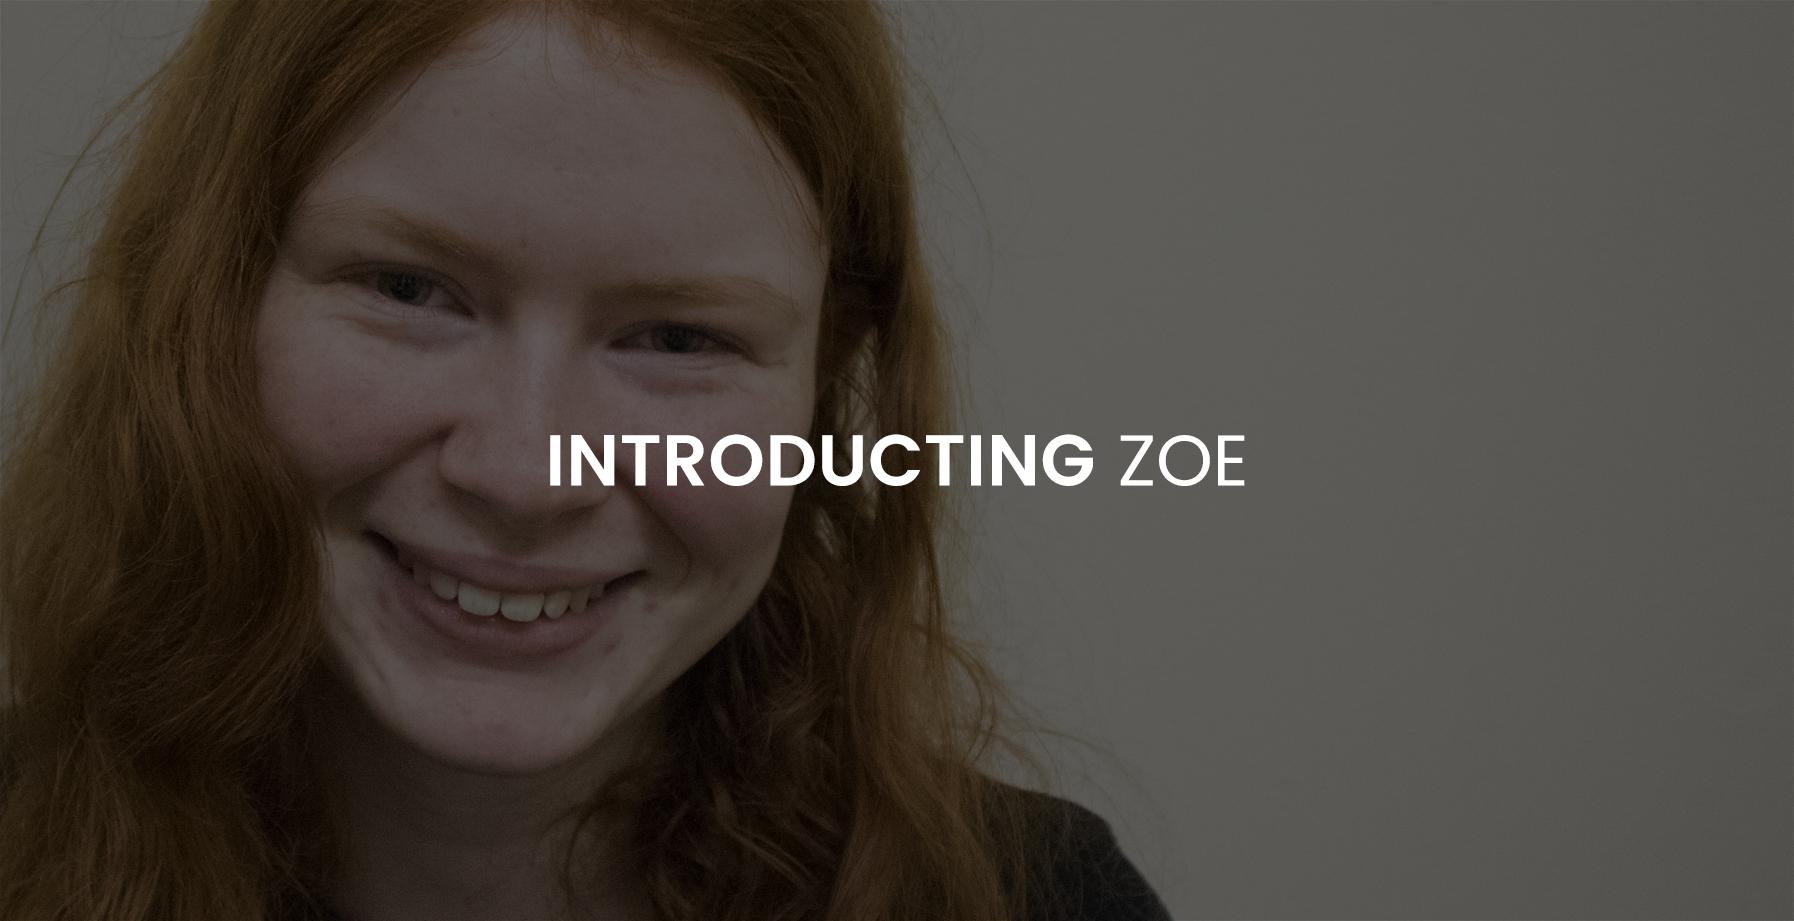 Introducing Zoe 1